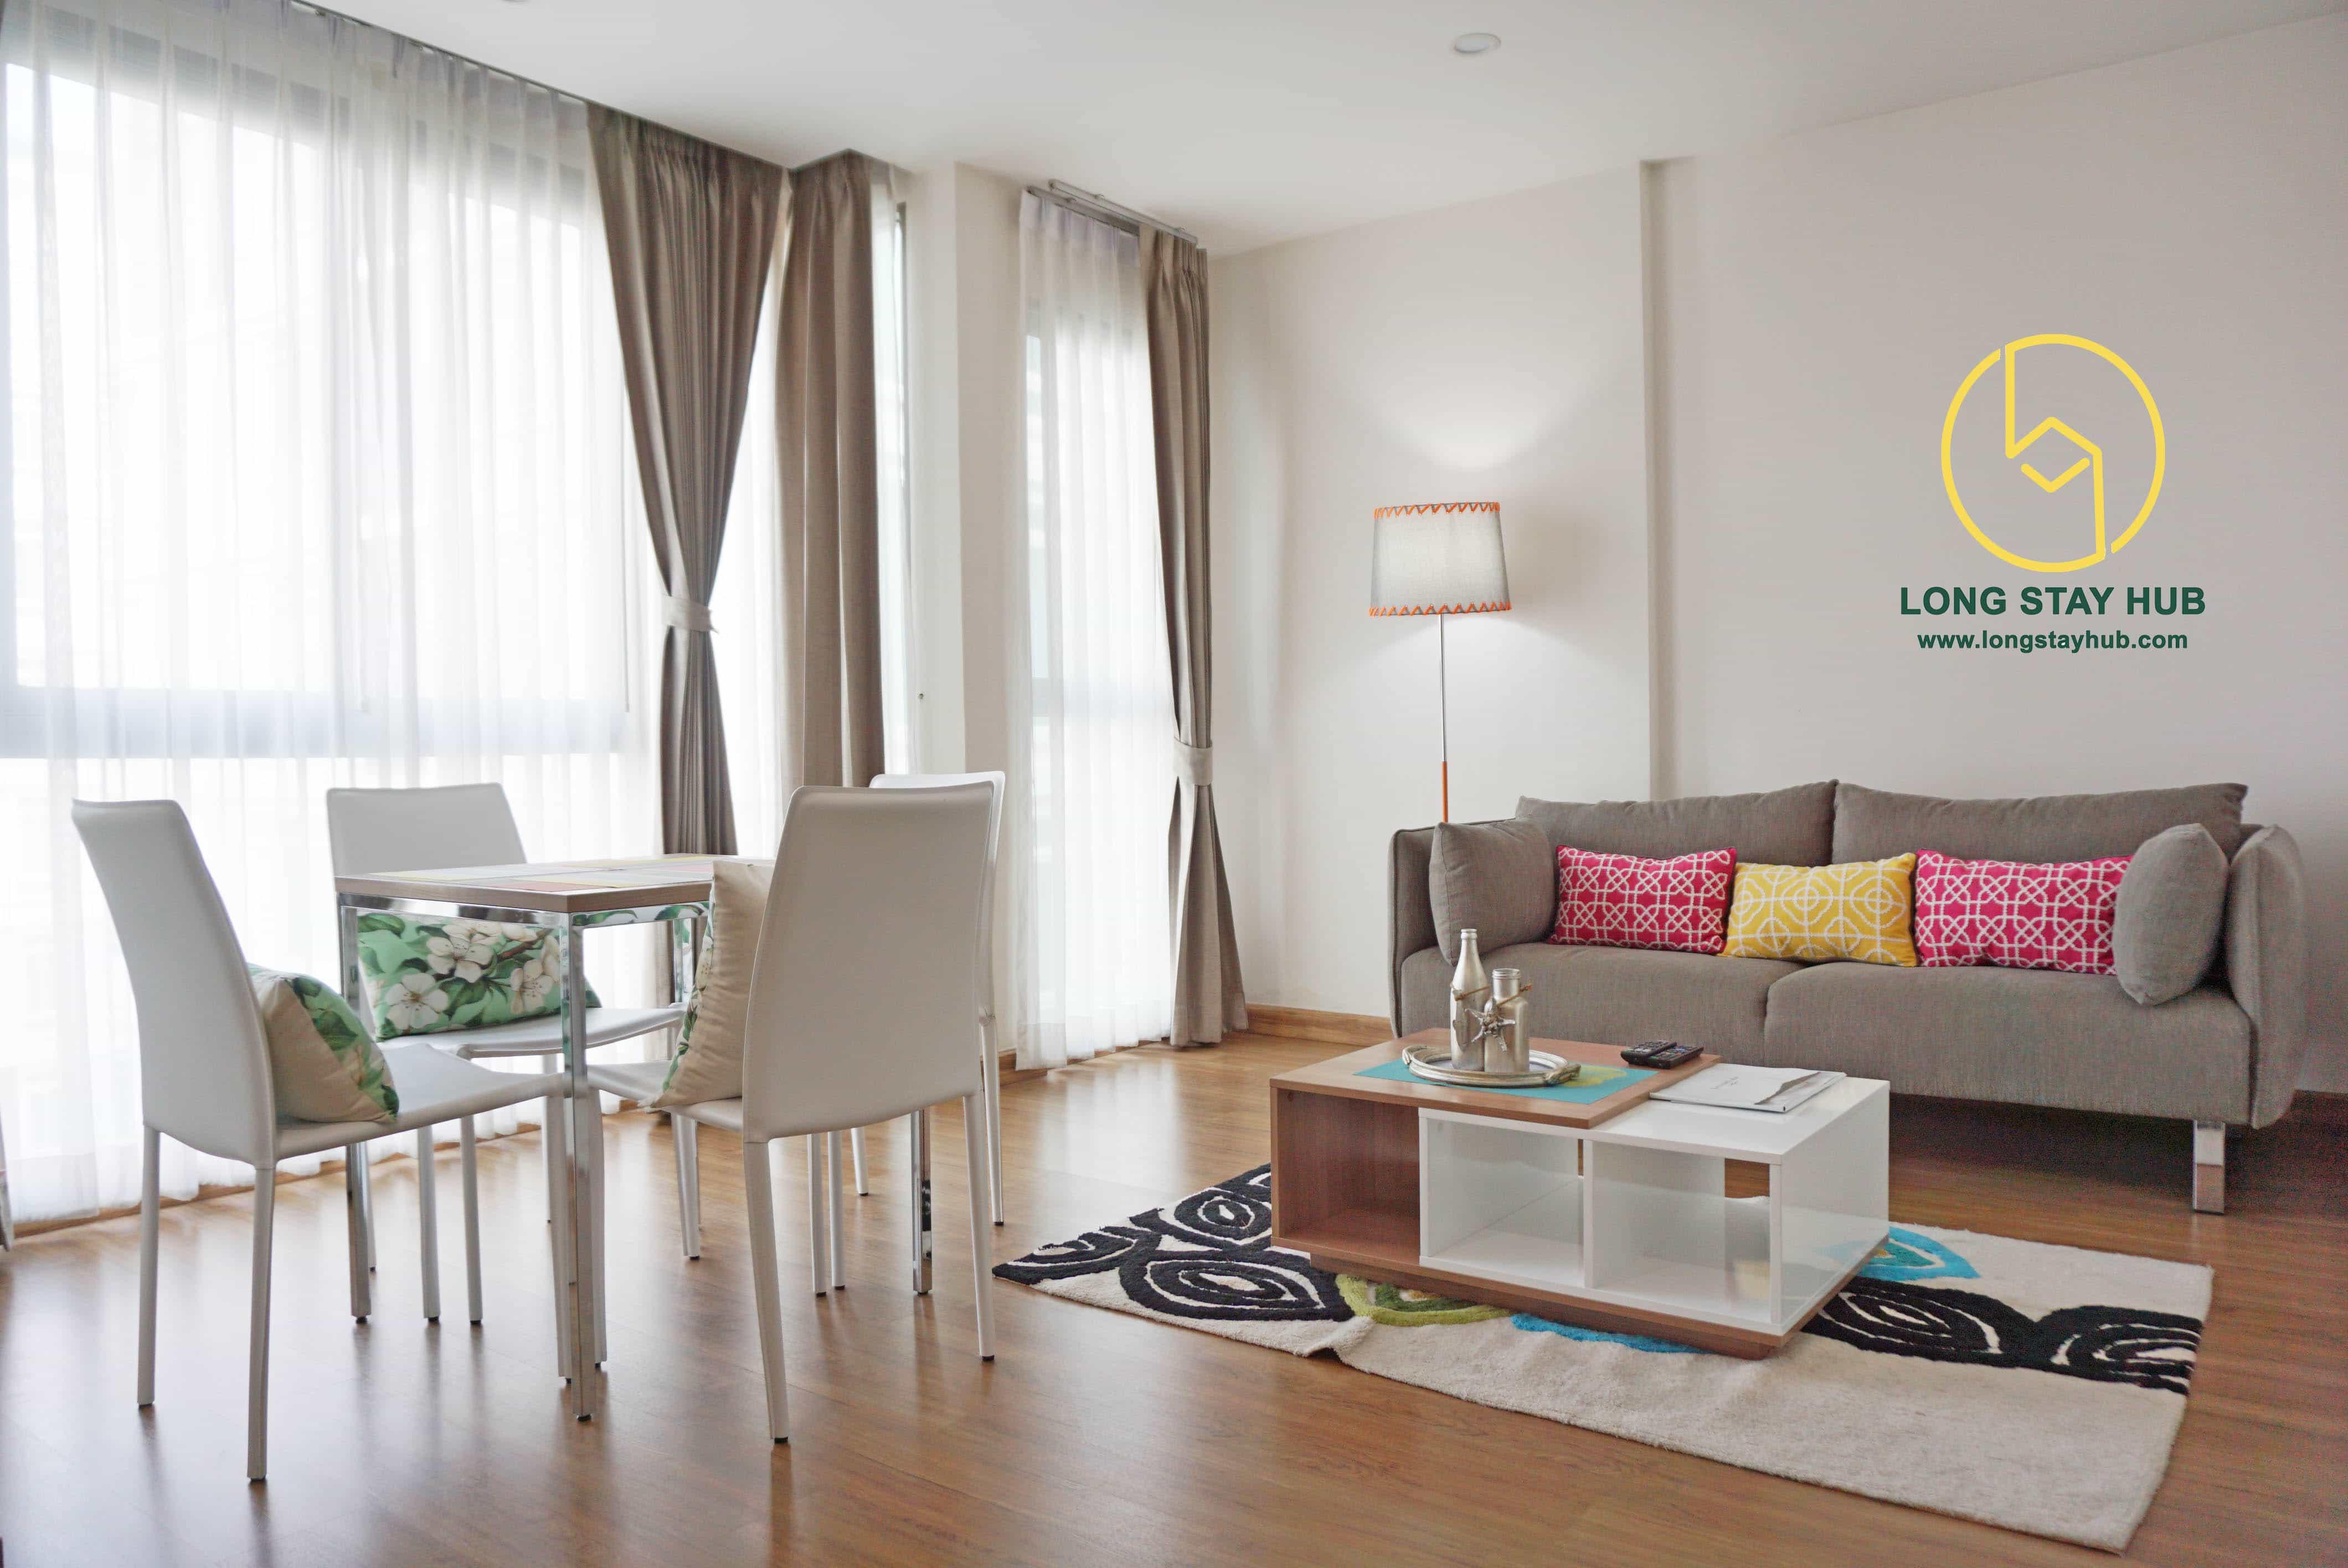 A 45 square-meter studio bedroom in the heart of Nimmanhaemin road.